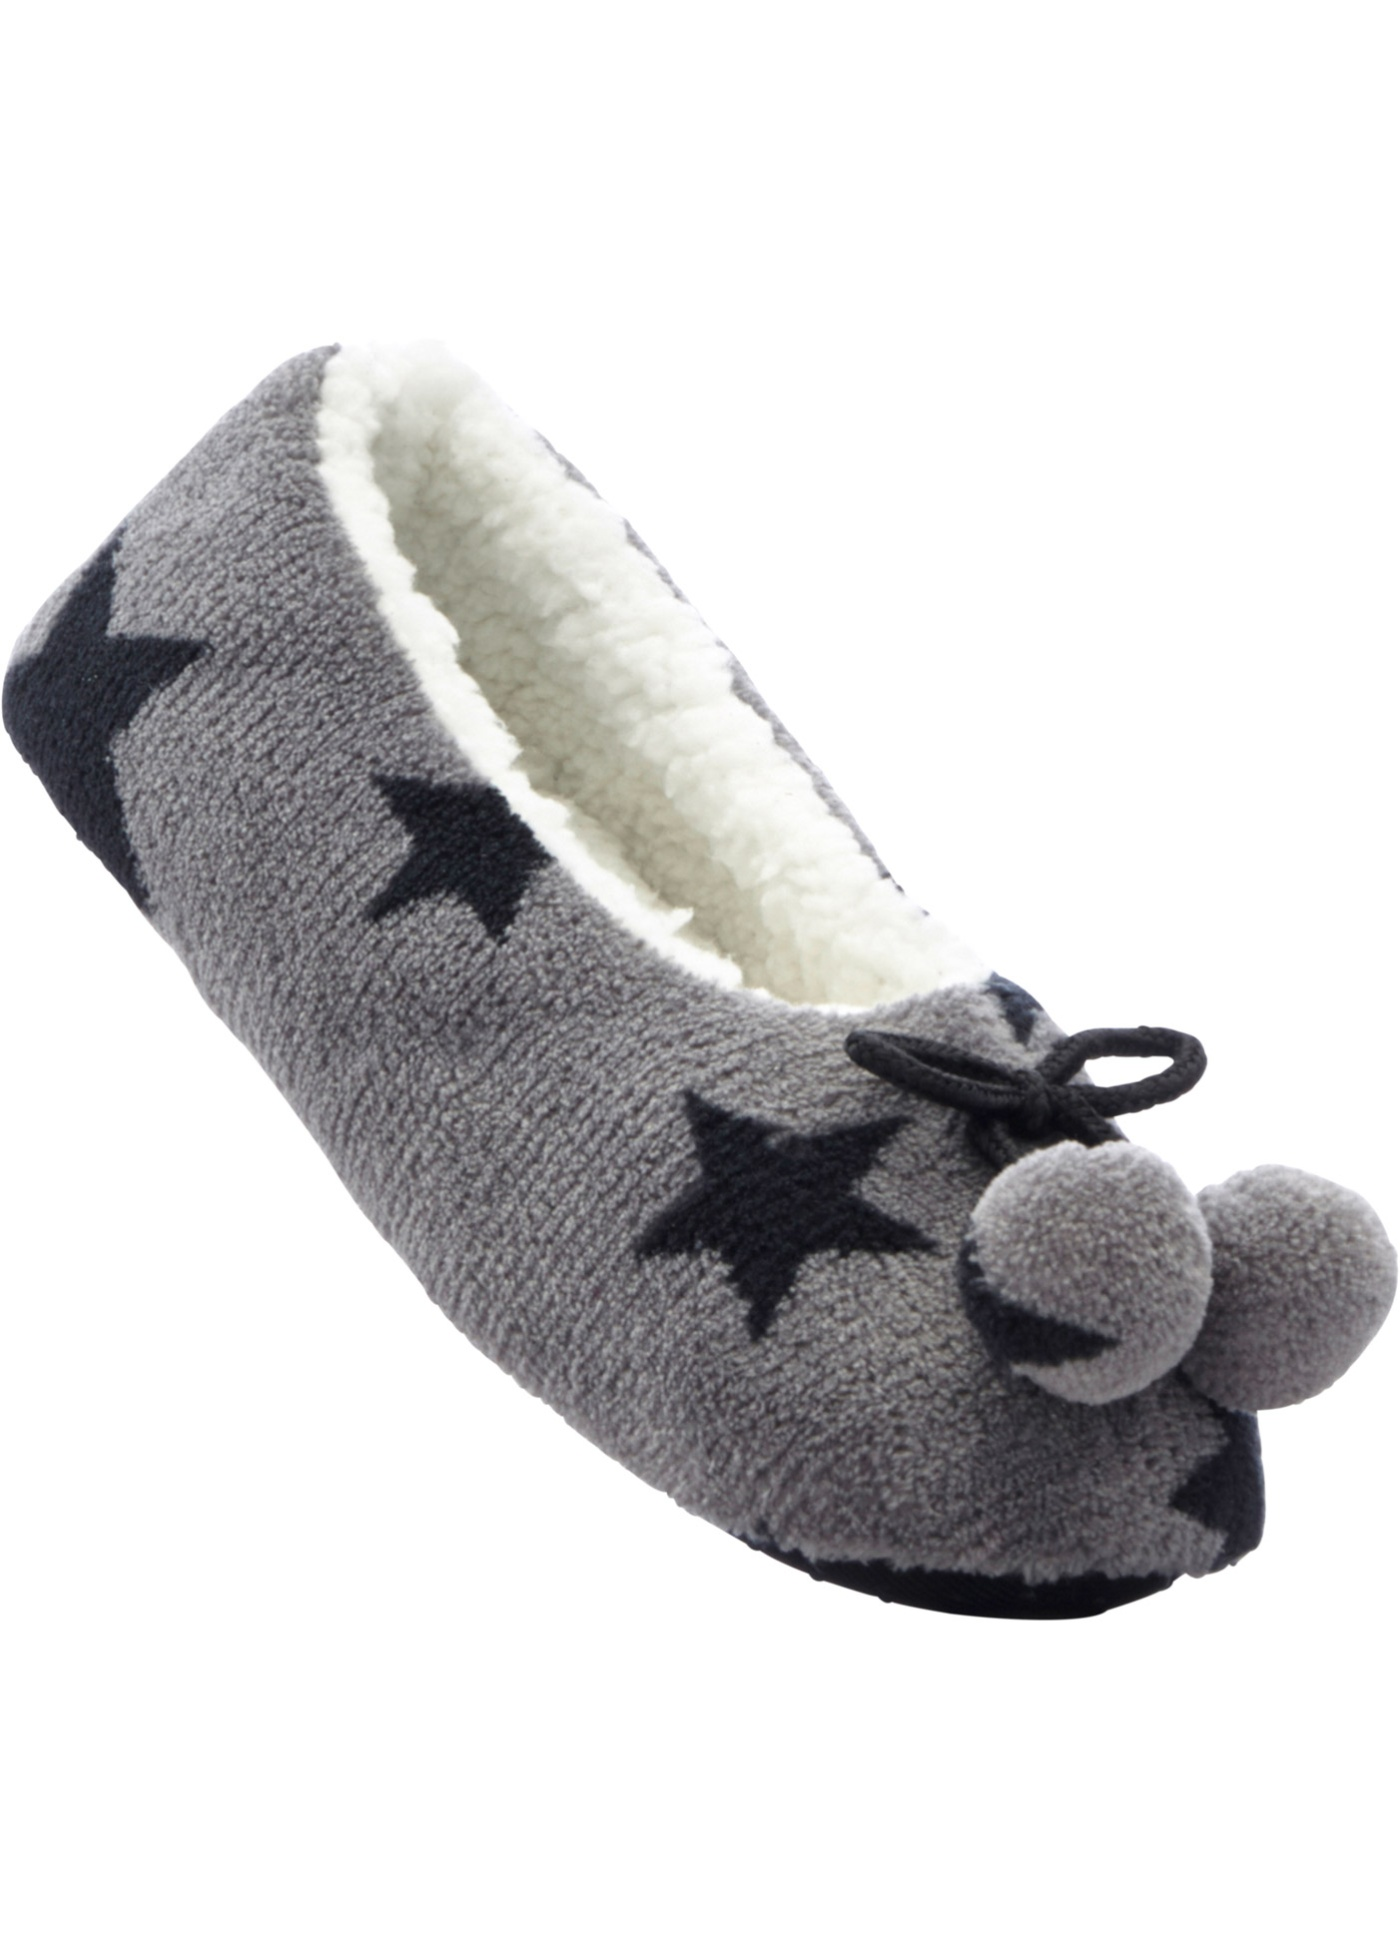 Pantofola Stelle  Grigio